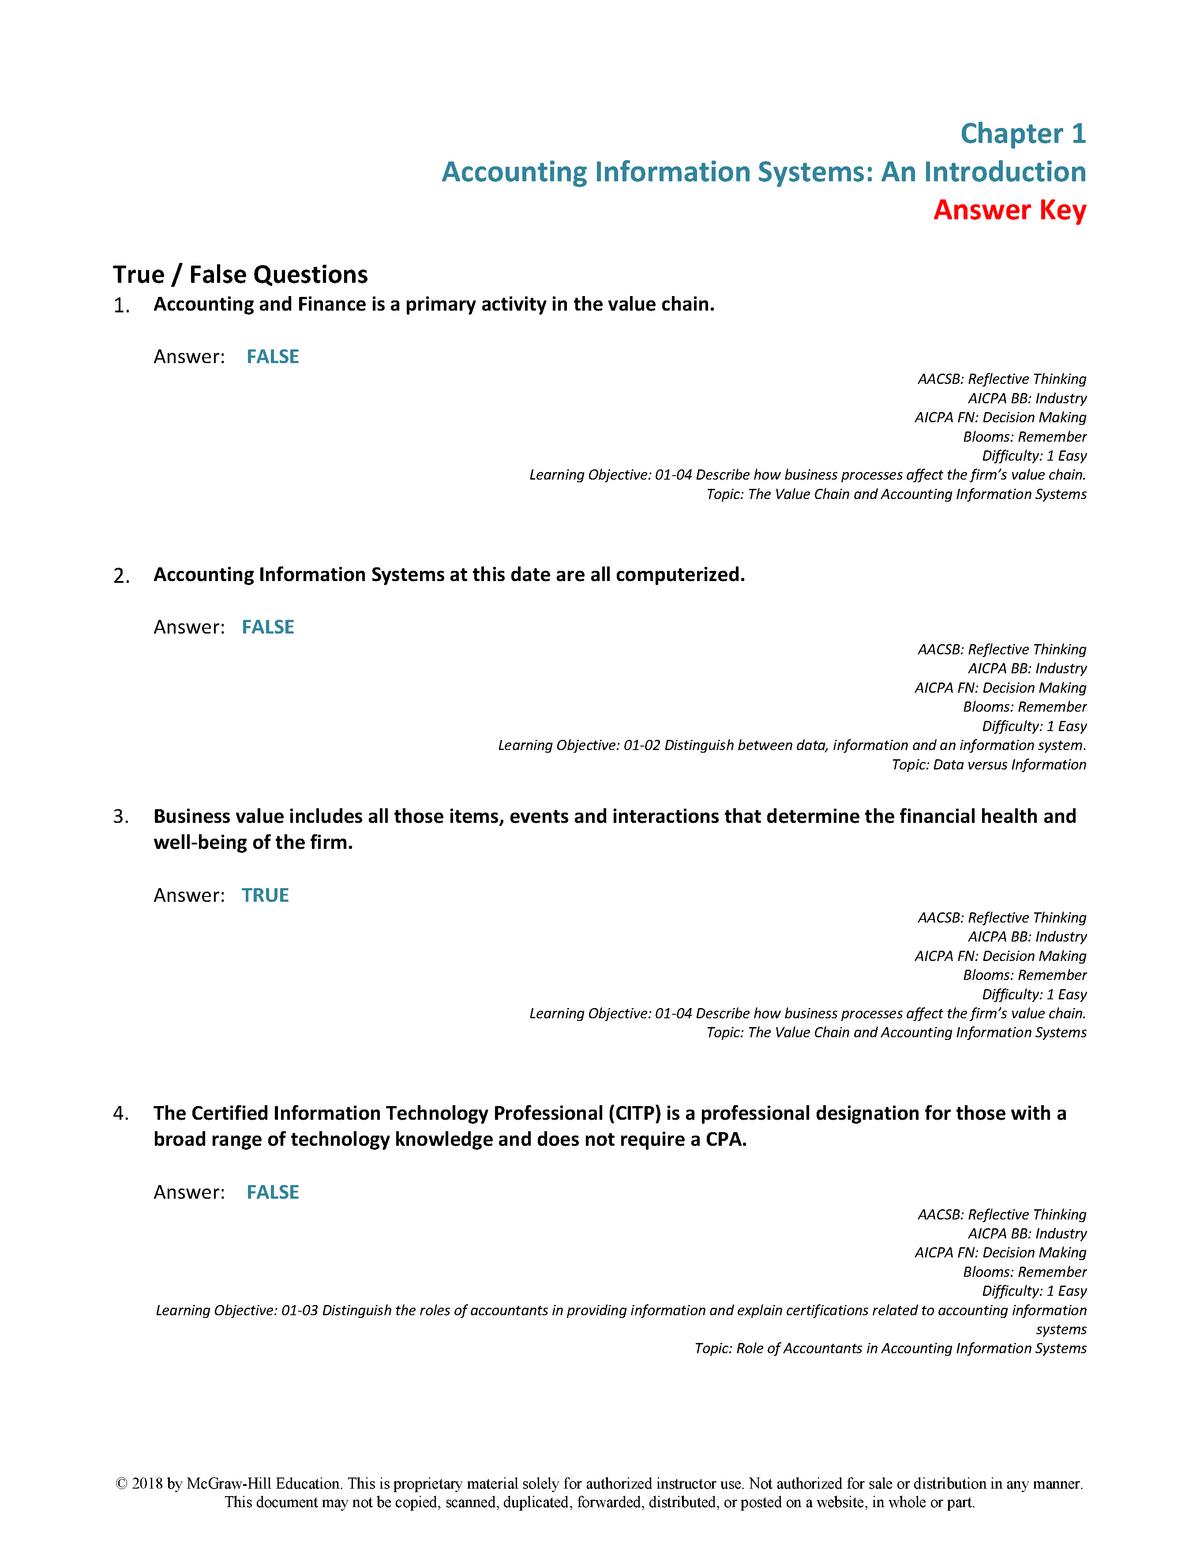 Richardson AIS 2e Test Bank Chapter 1 Final - ACCT 3004: Accounting